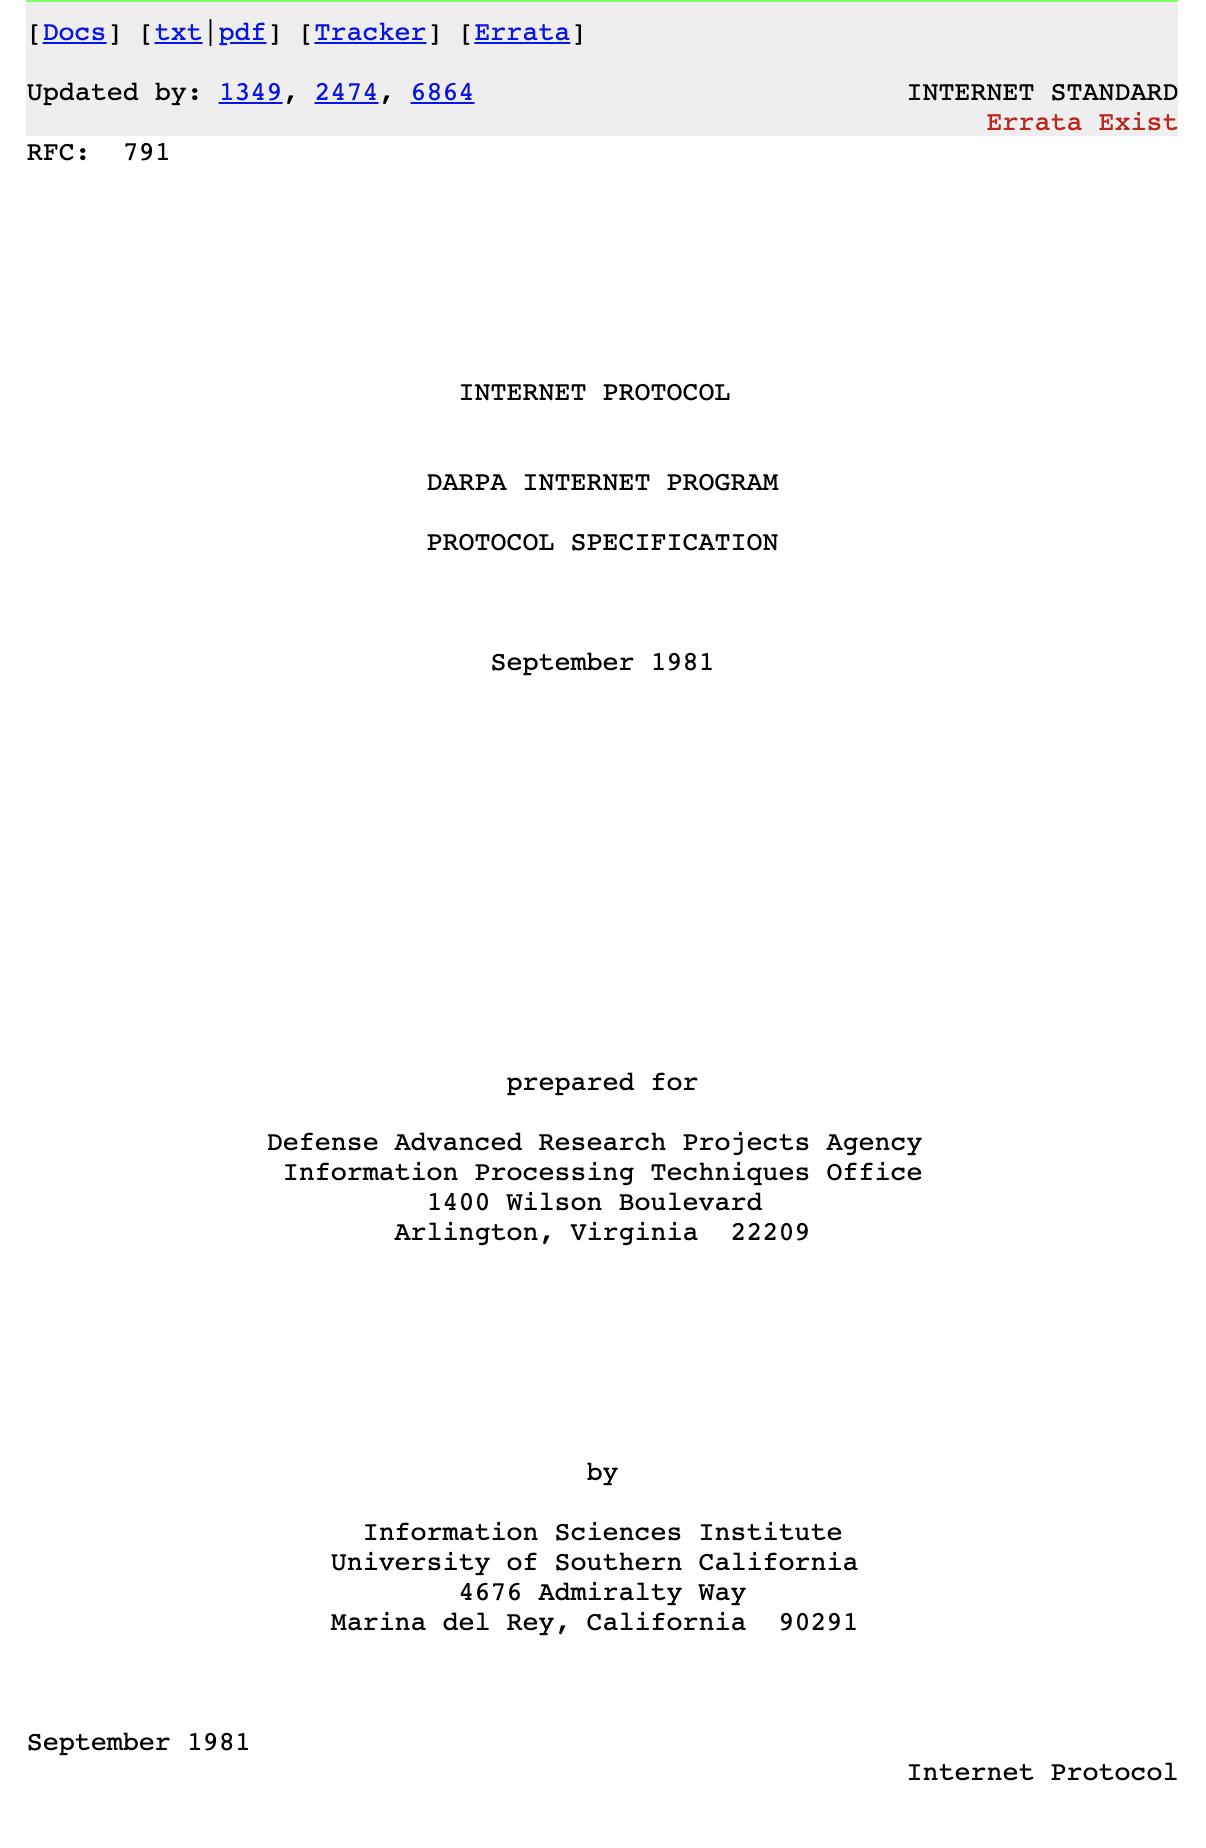 Internet Protocol (RFC791)